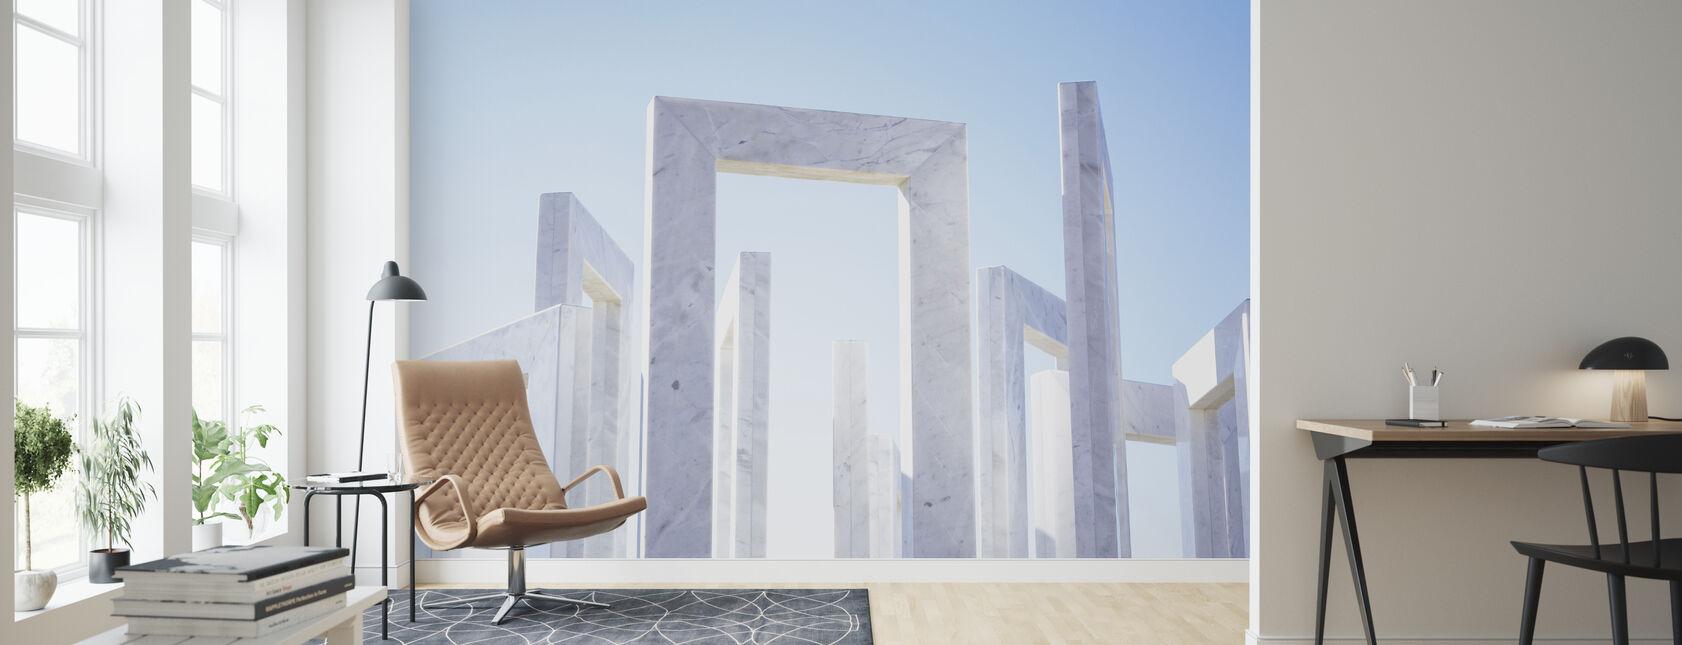 Monuments - Wallpaper - Living Room